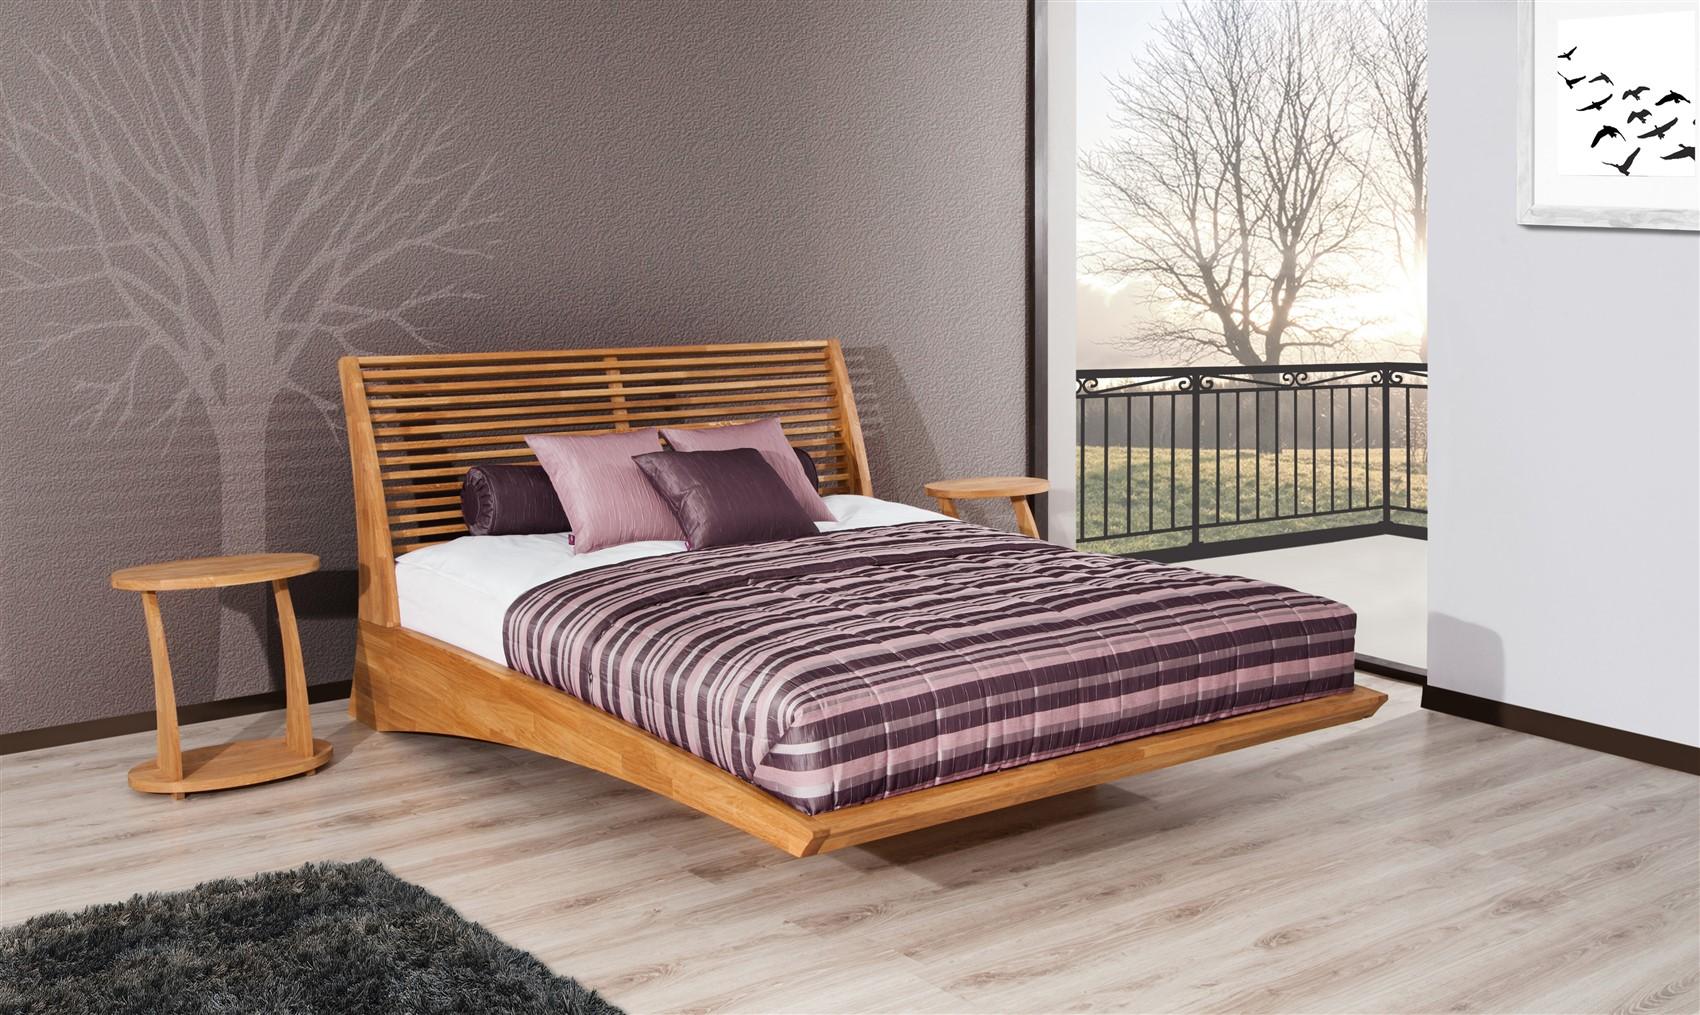 massivholzbett bett schlafzimmerbett fresno buche massiv 160x200 cm fun m bel. Black Bedroom Furniture Sets. Home Design Ideas